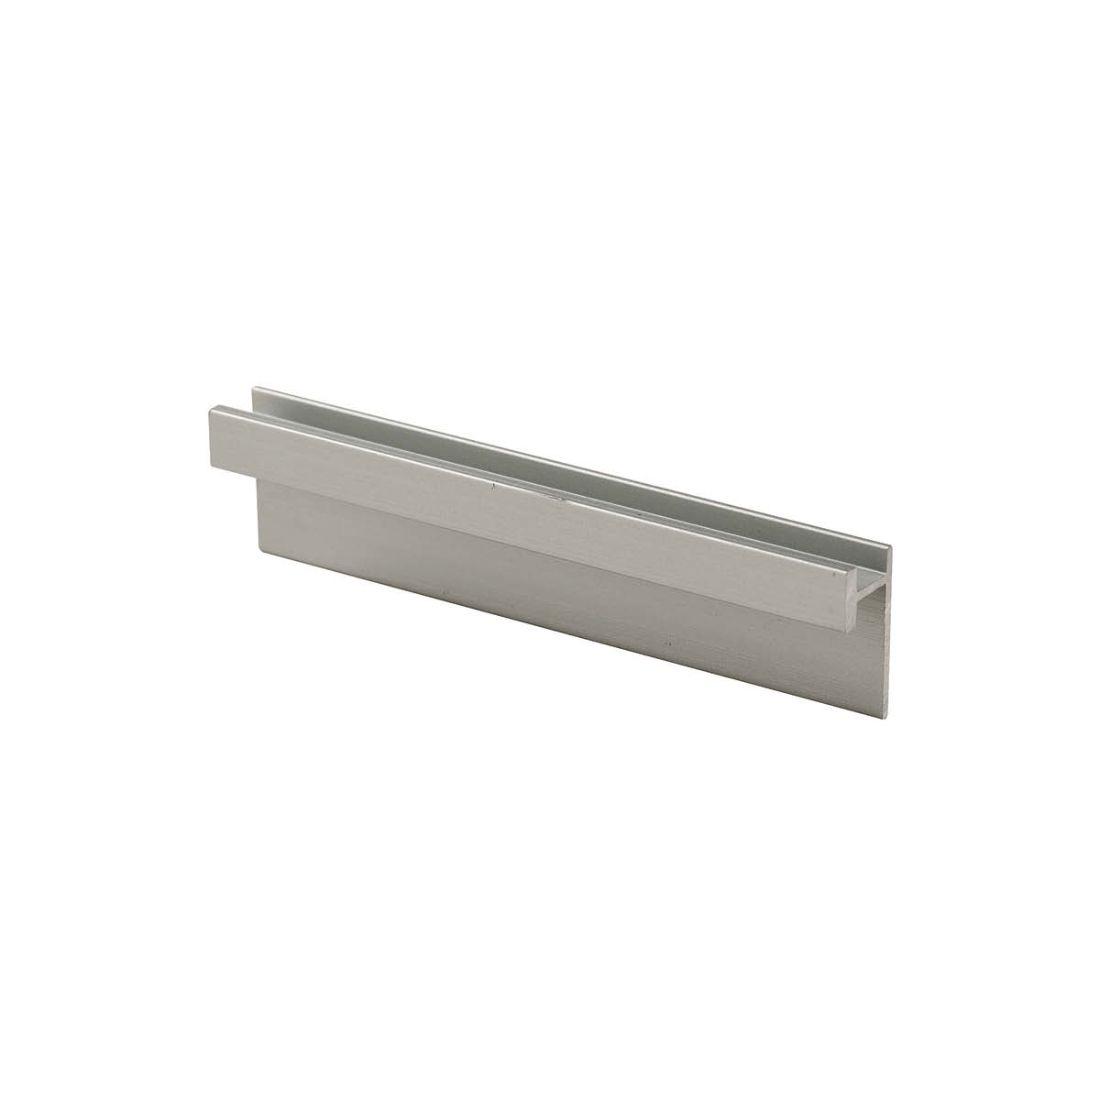 Aluminium Internal Corner Jointer Silver Bullet 2700 x 4.5mm